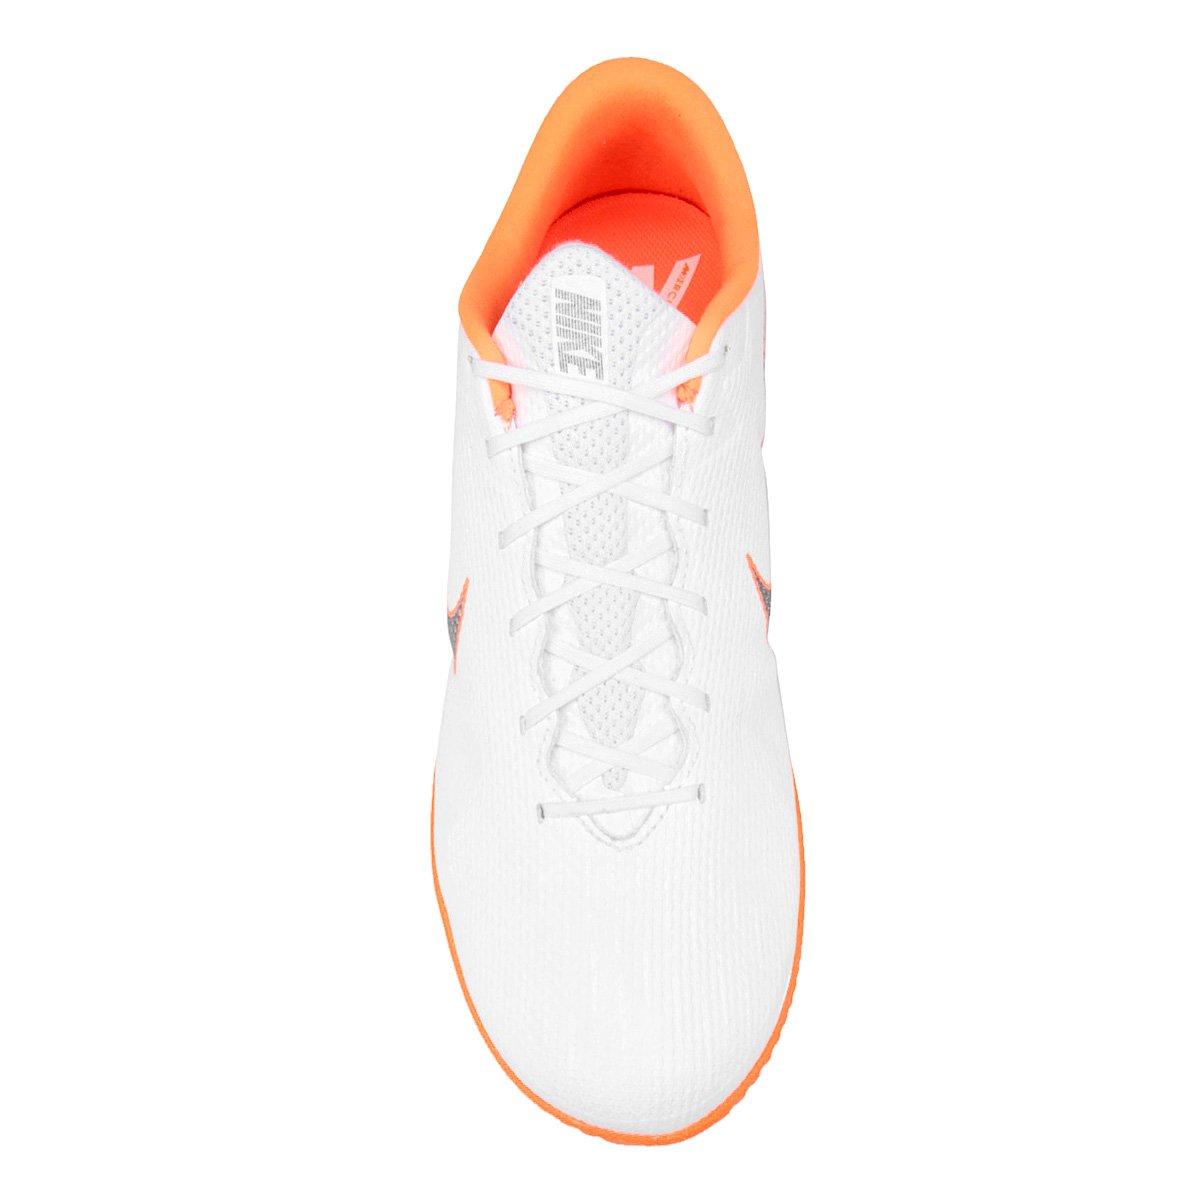 2a1a8aa5c3 Chuteira Futsal Nike Mercurial Vapor 12 Academy - Branco e Cinza ...